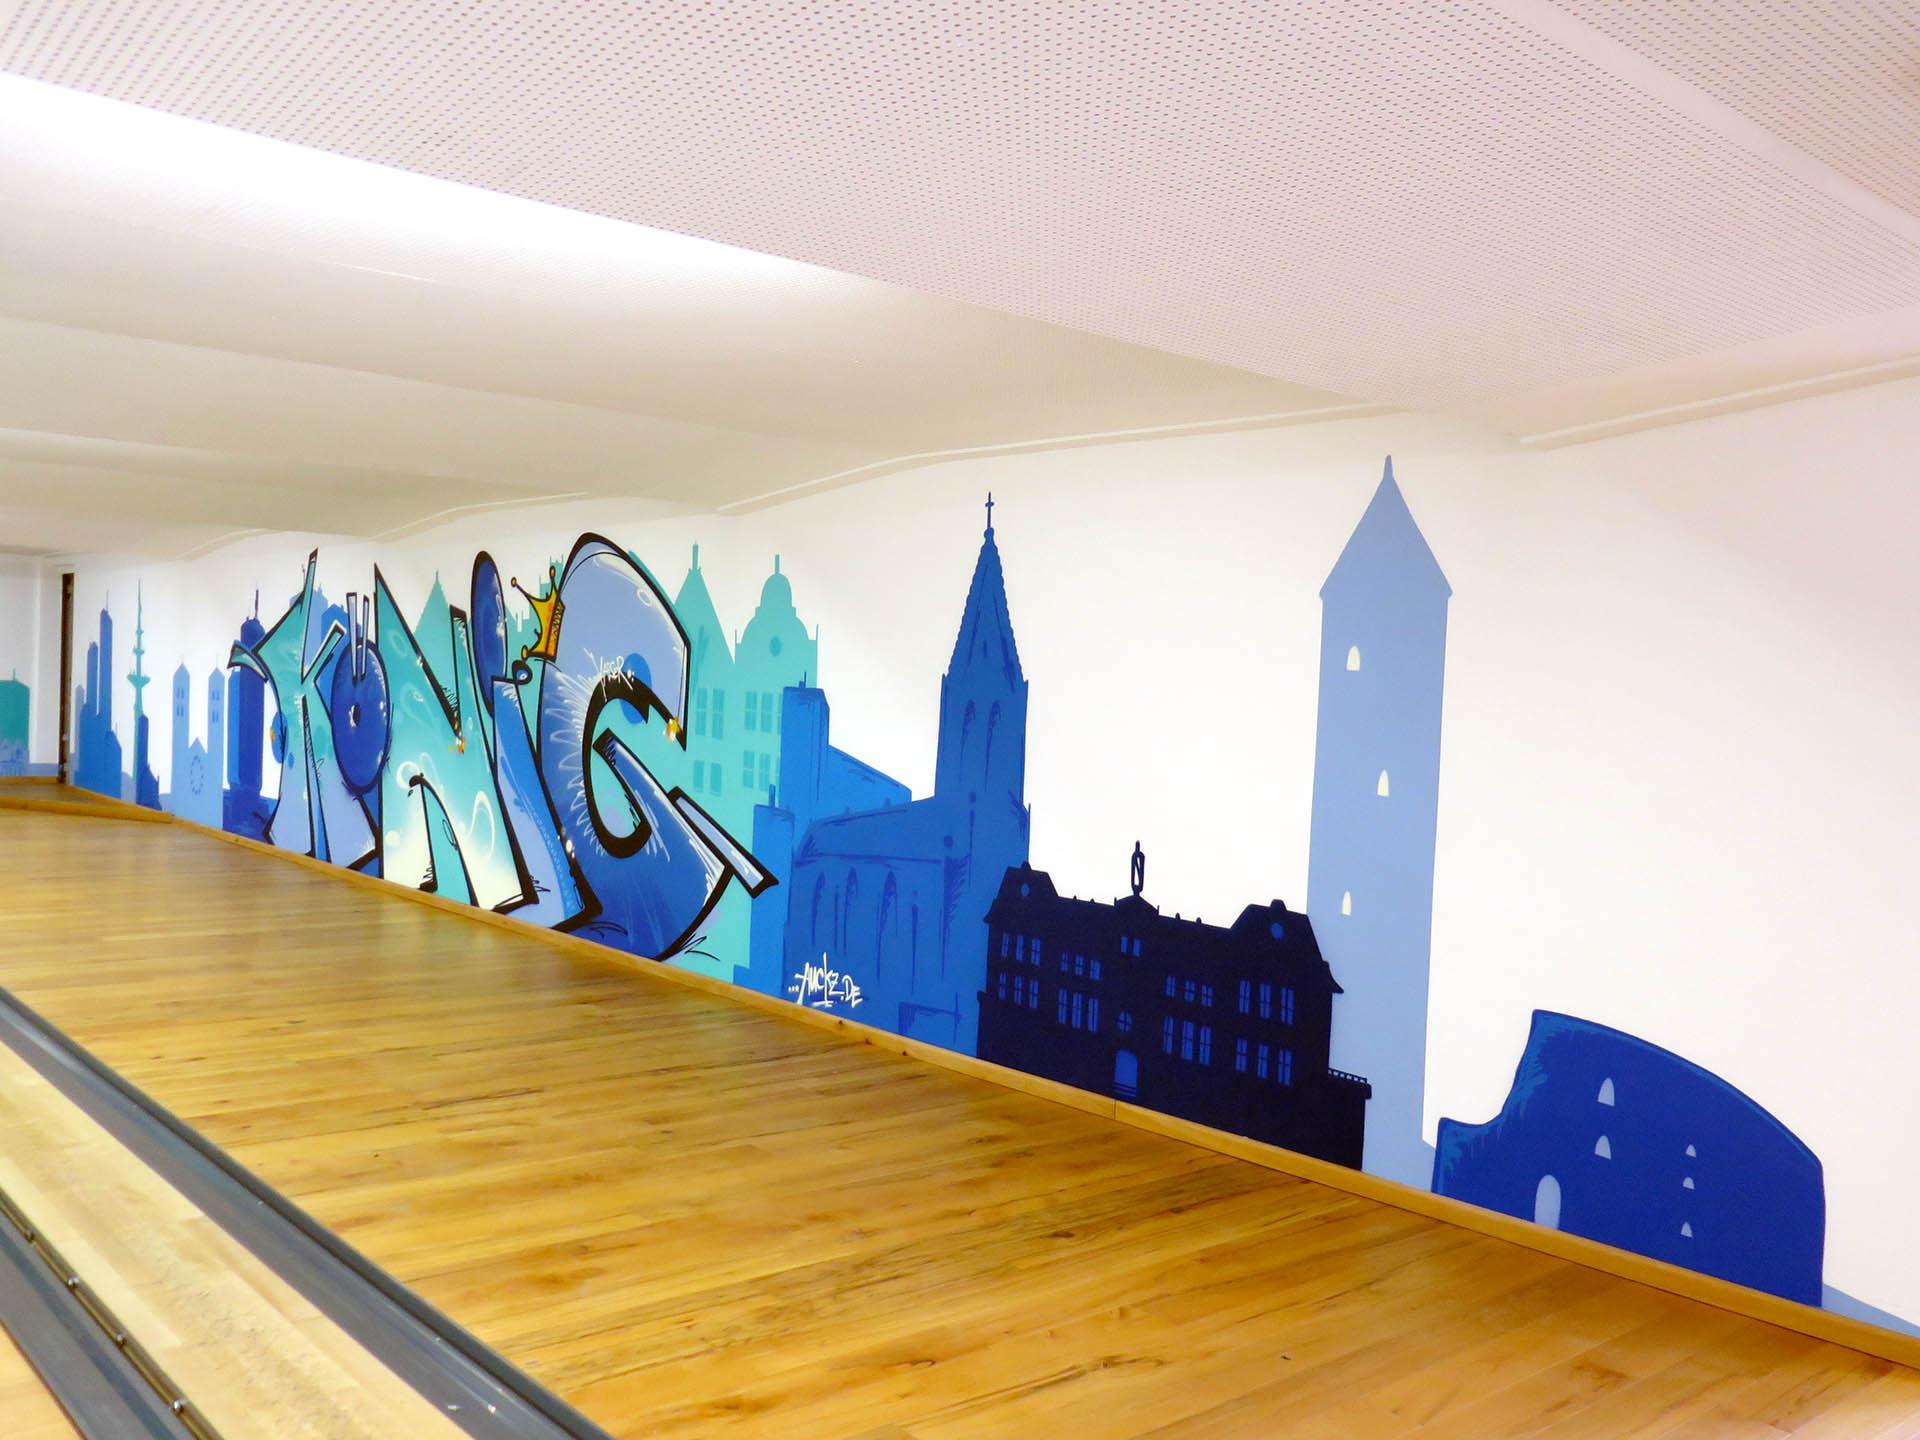 Kegelbahn, Design, Graffiti, Kegel, König, Polizeiakademie, Sprayen, Raum, Bennet Grüttner